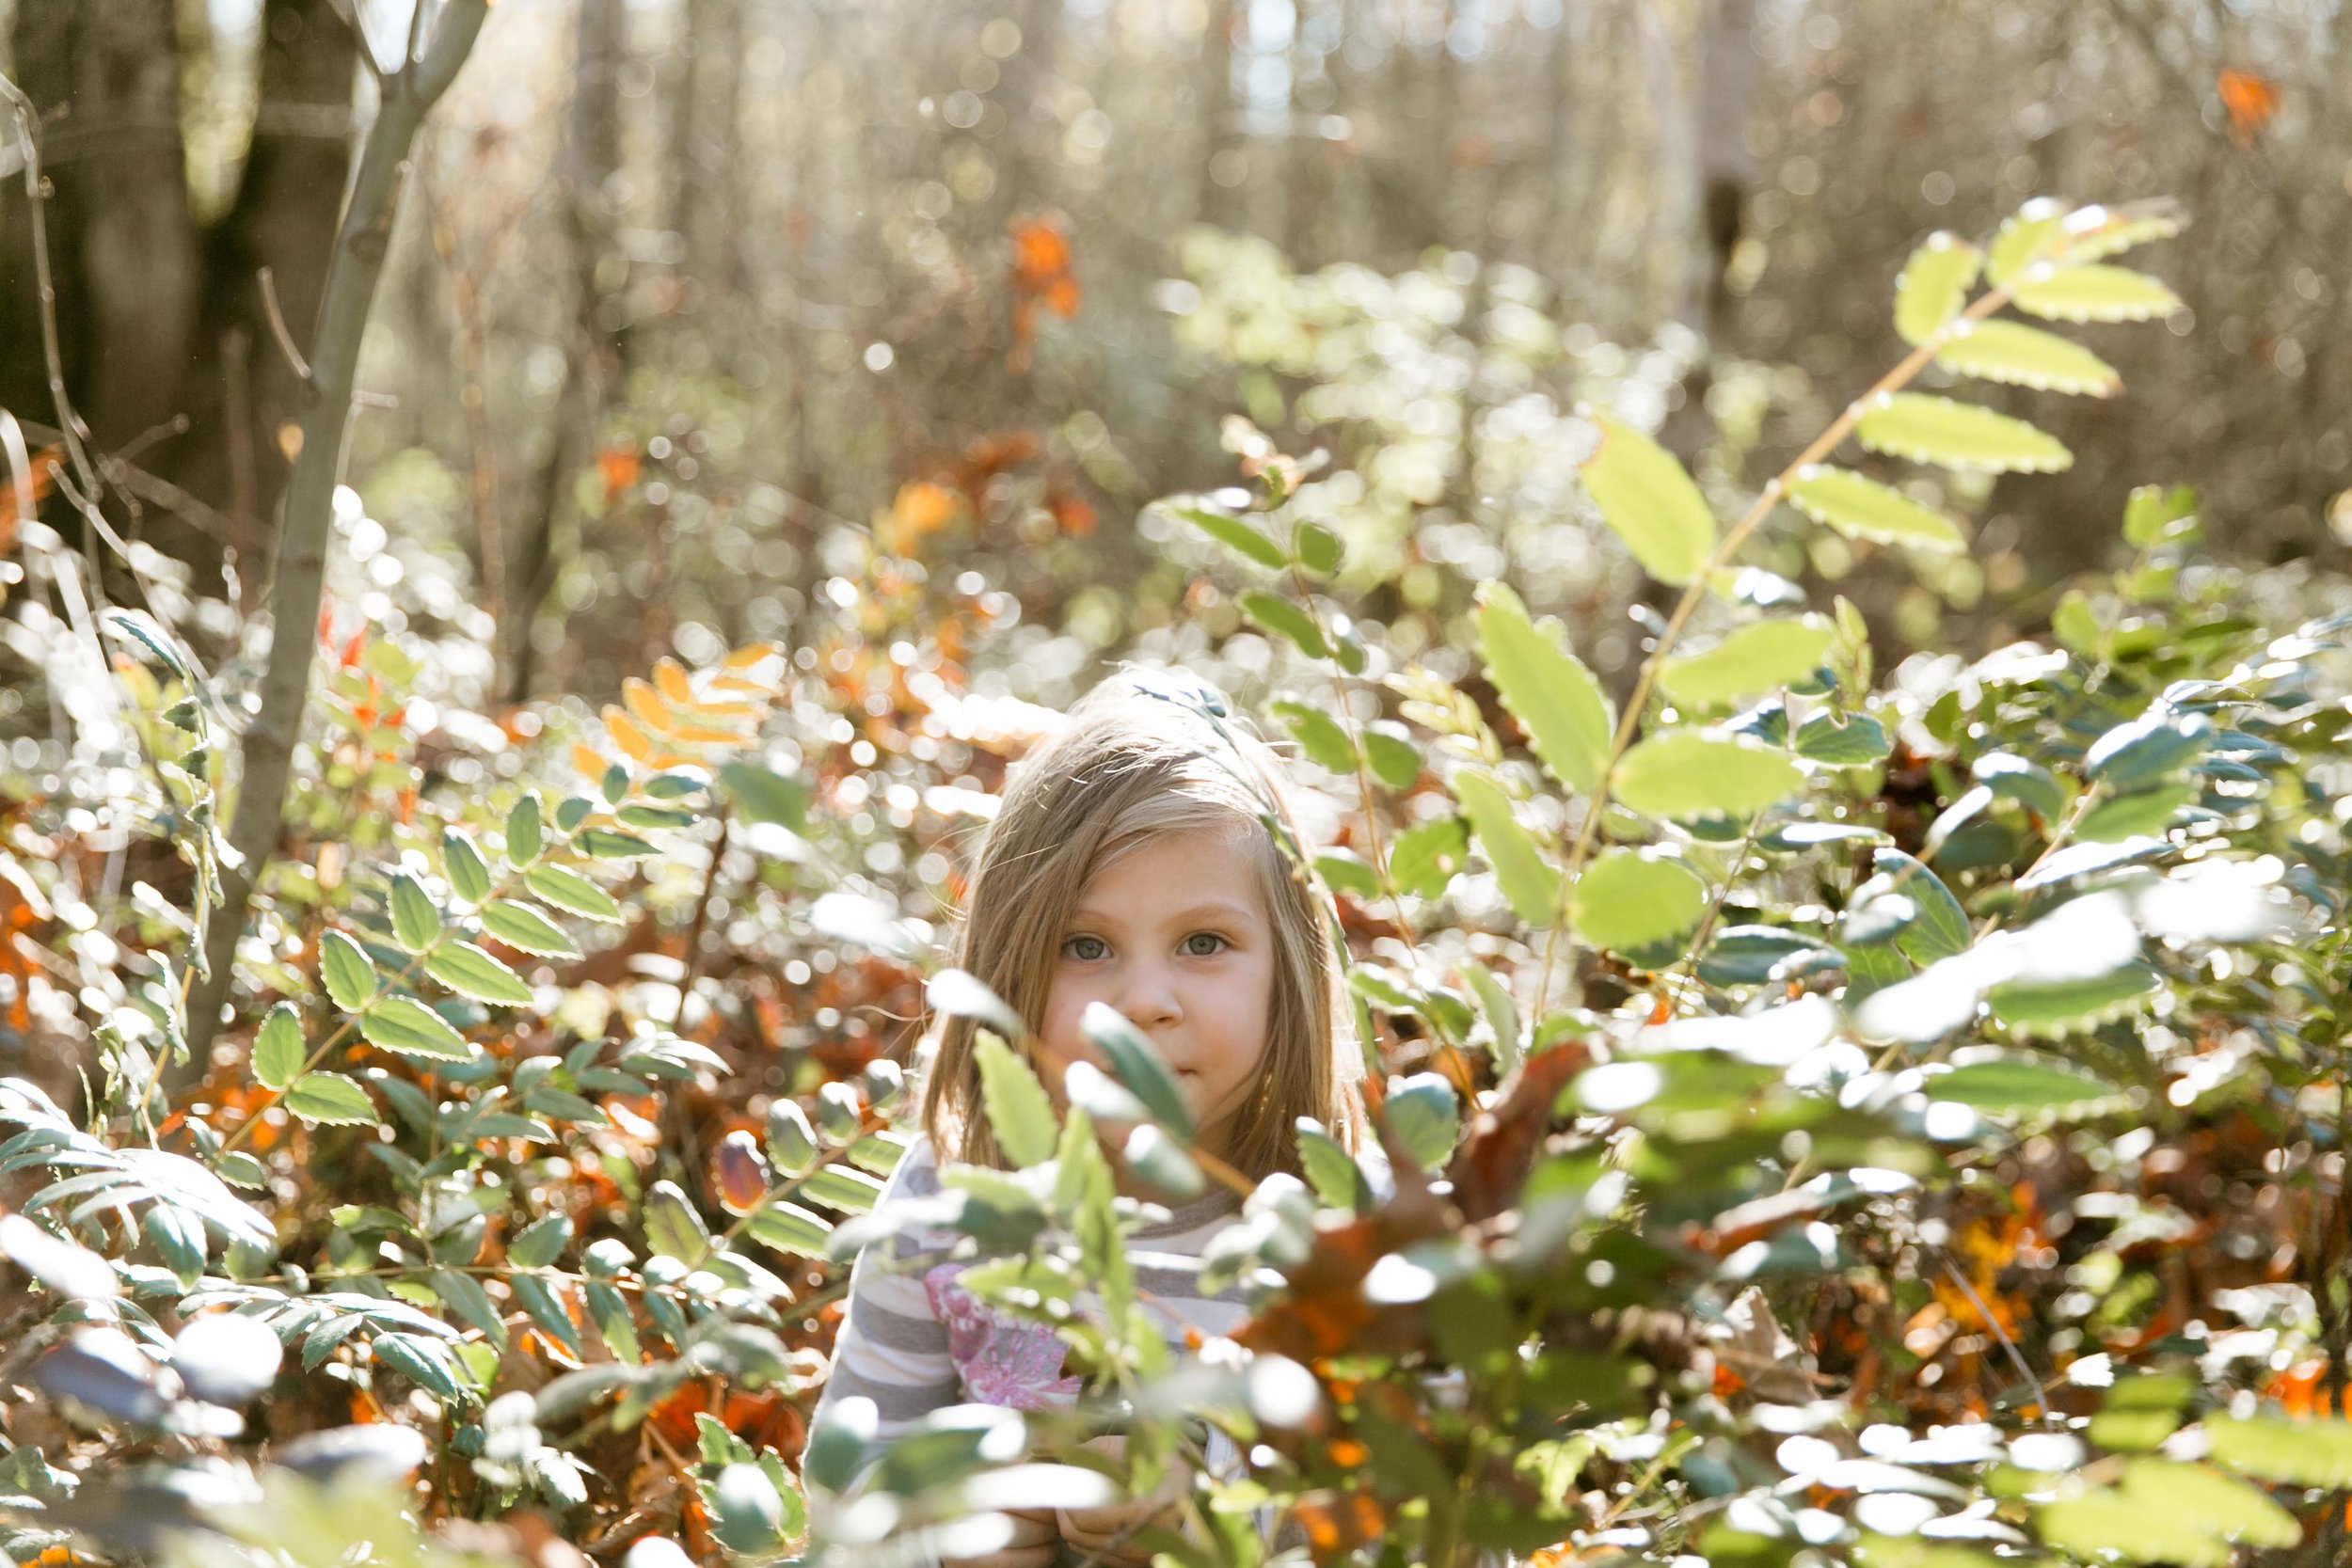 Sienna-Renee-Photography-Nature-Nuts-0633.jpg